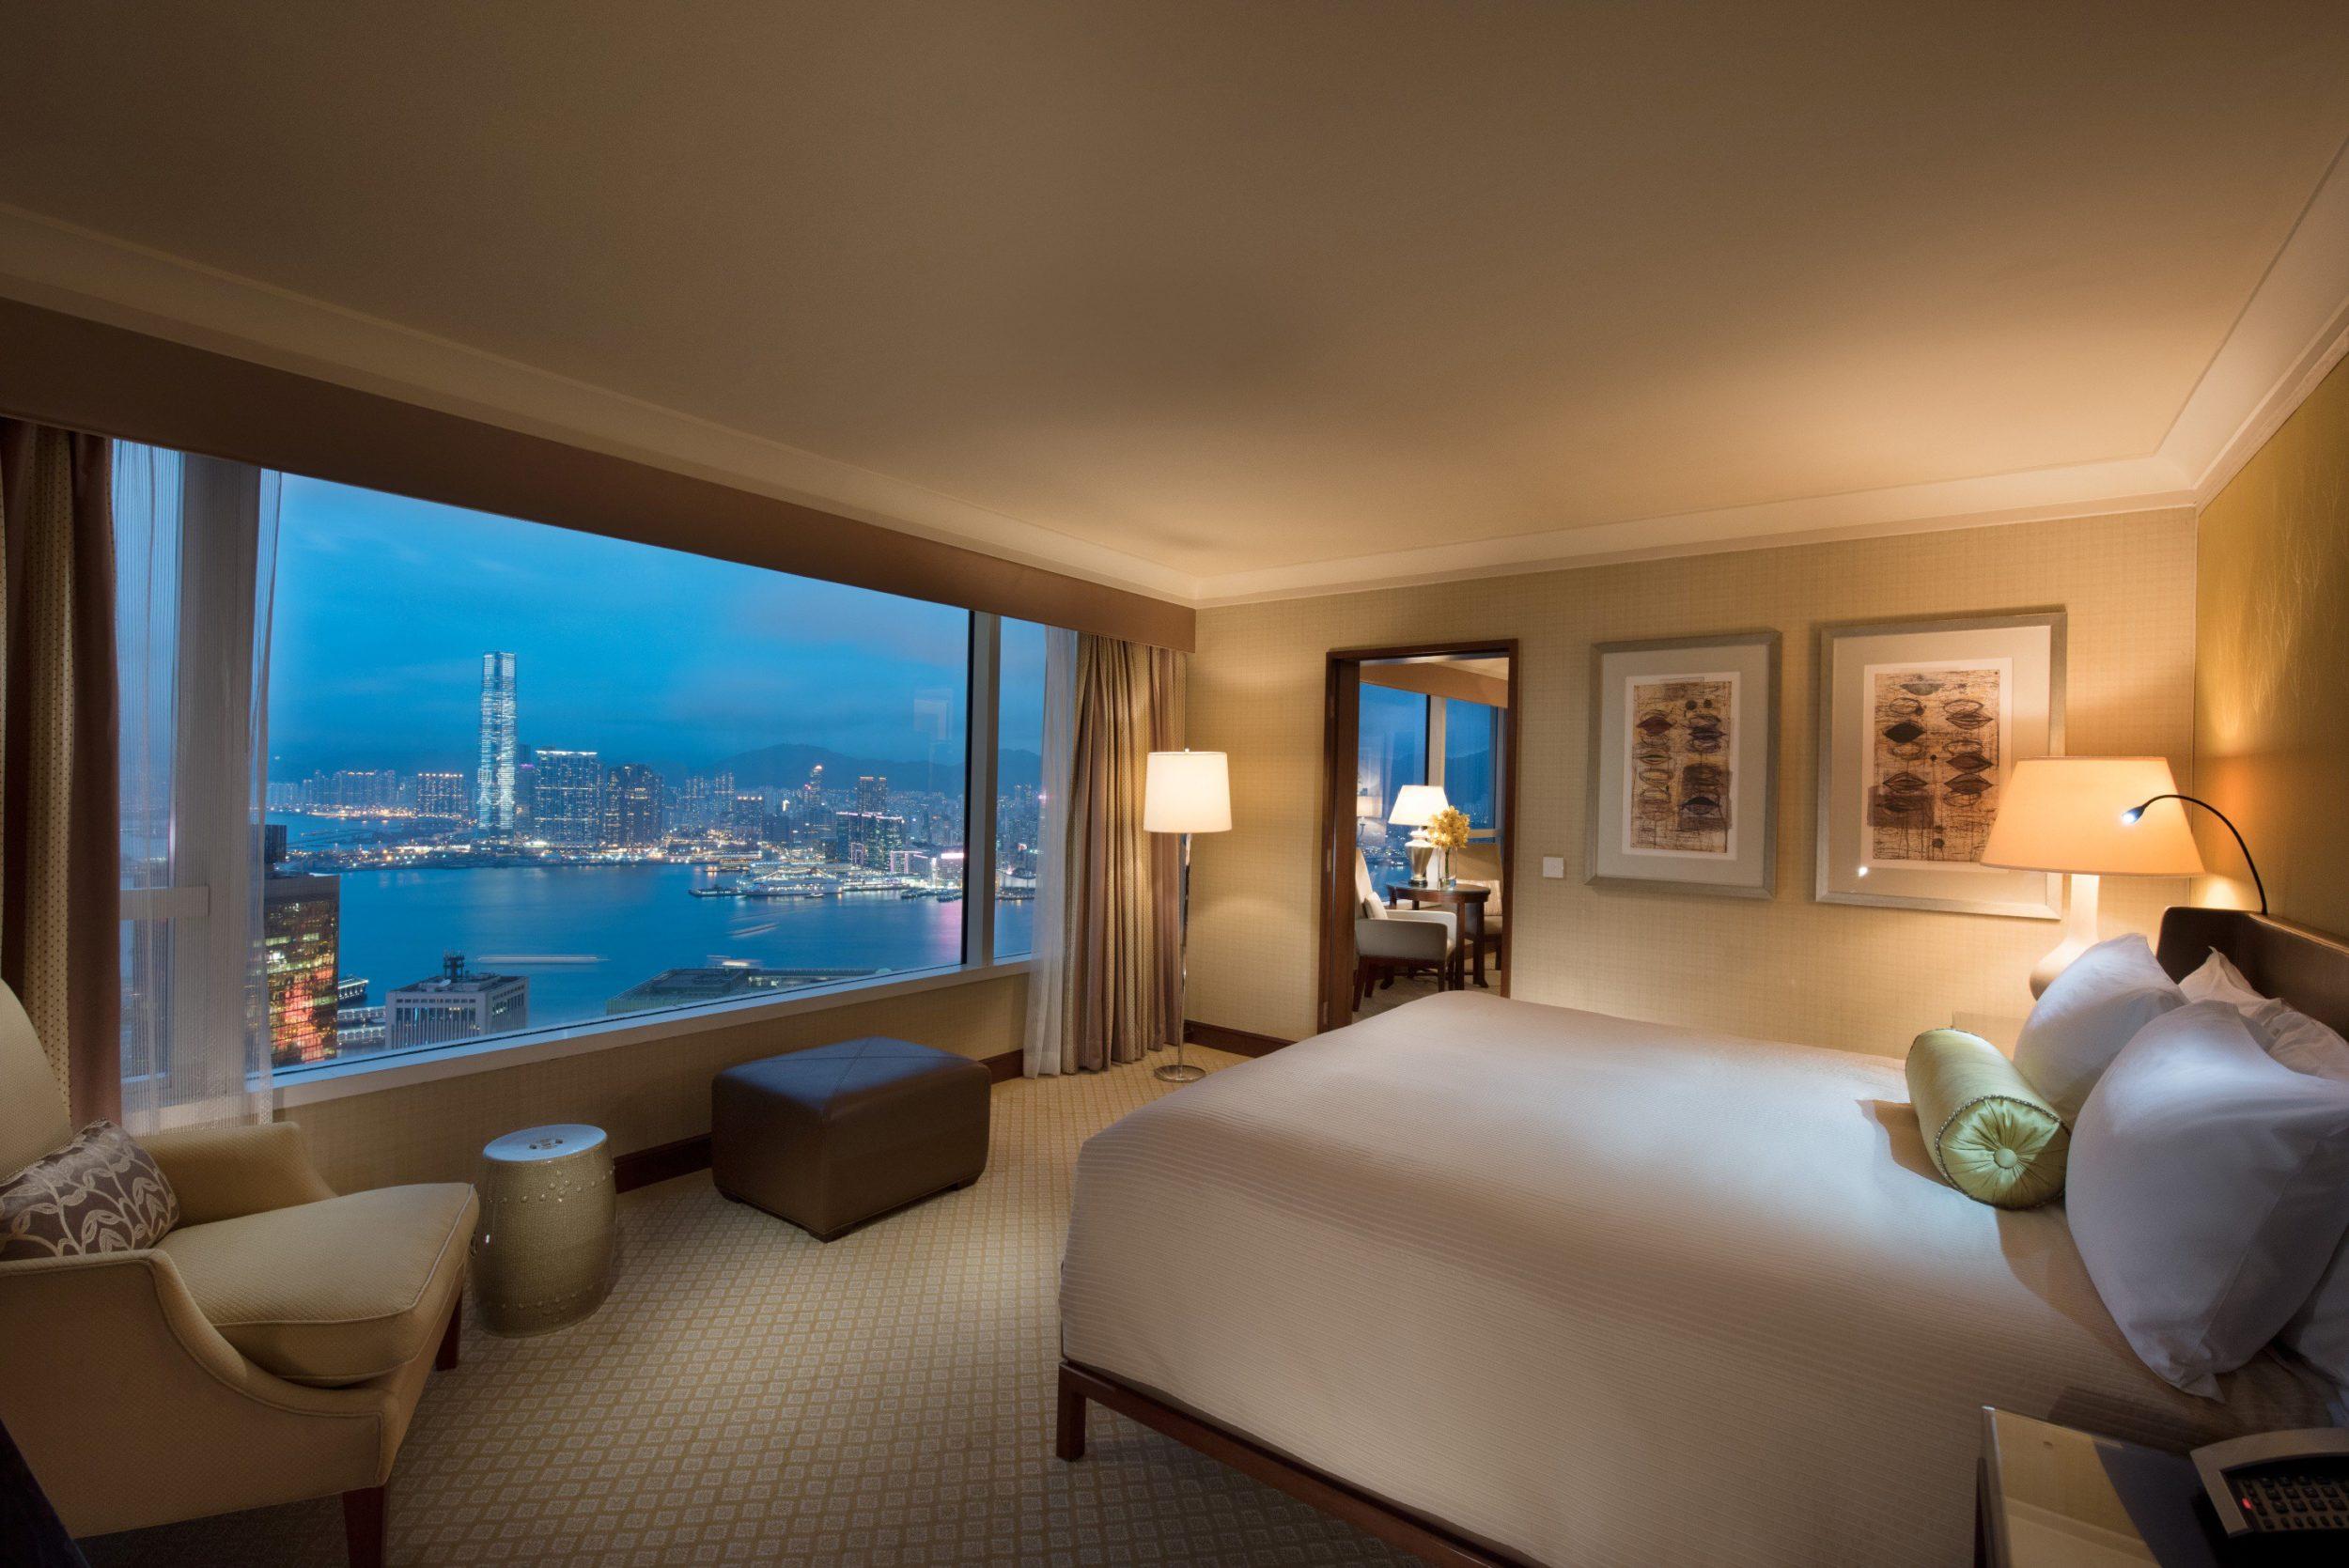 La Jolla Hotel Rooms